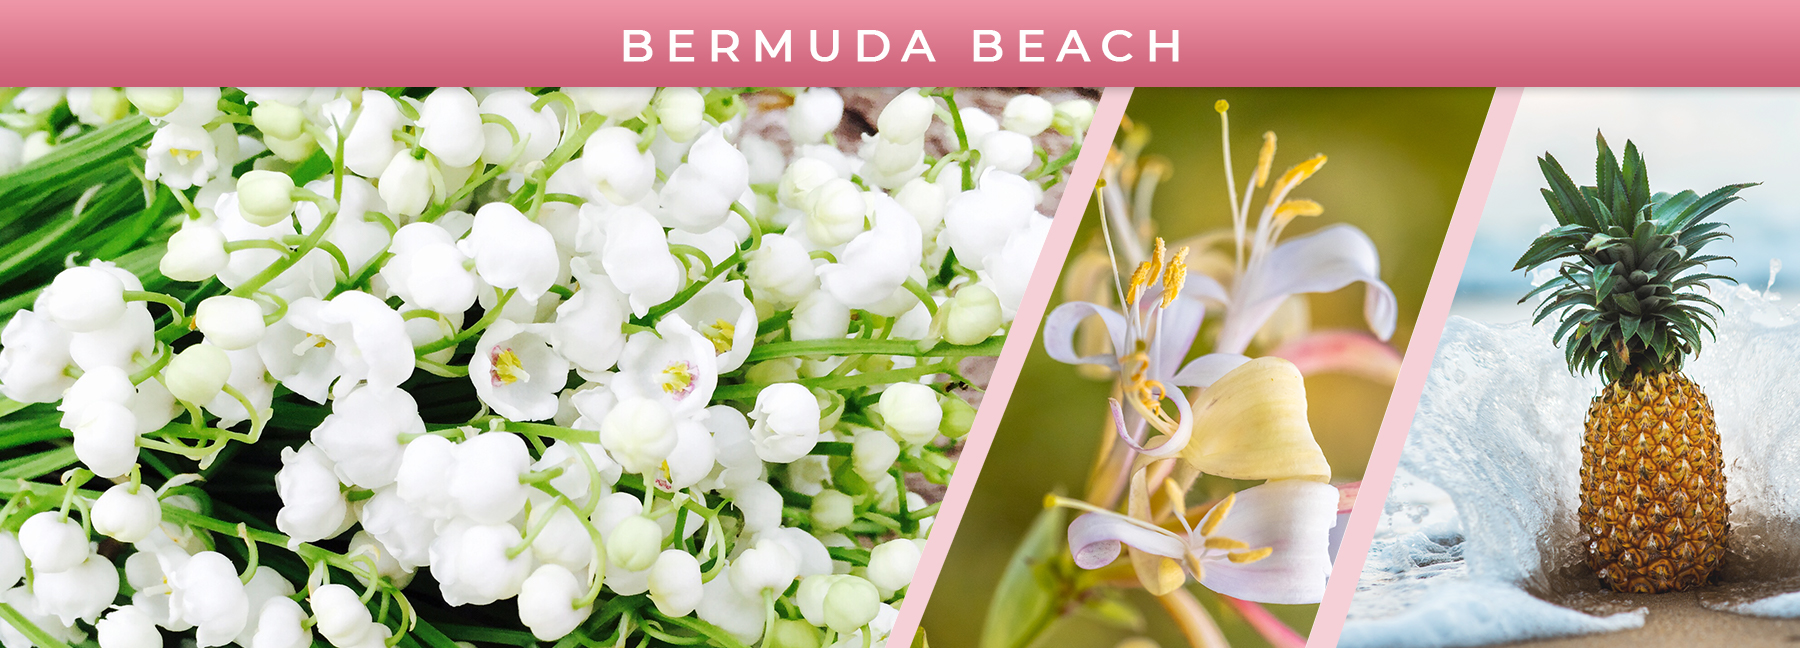 Bermuda Beach fragrance elements